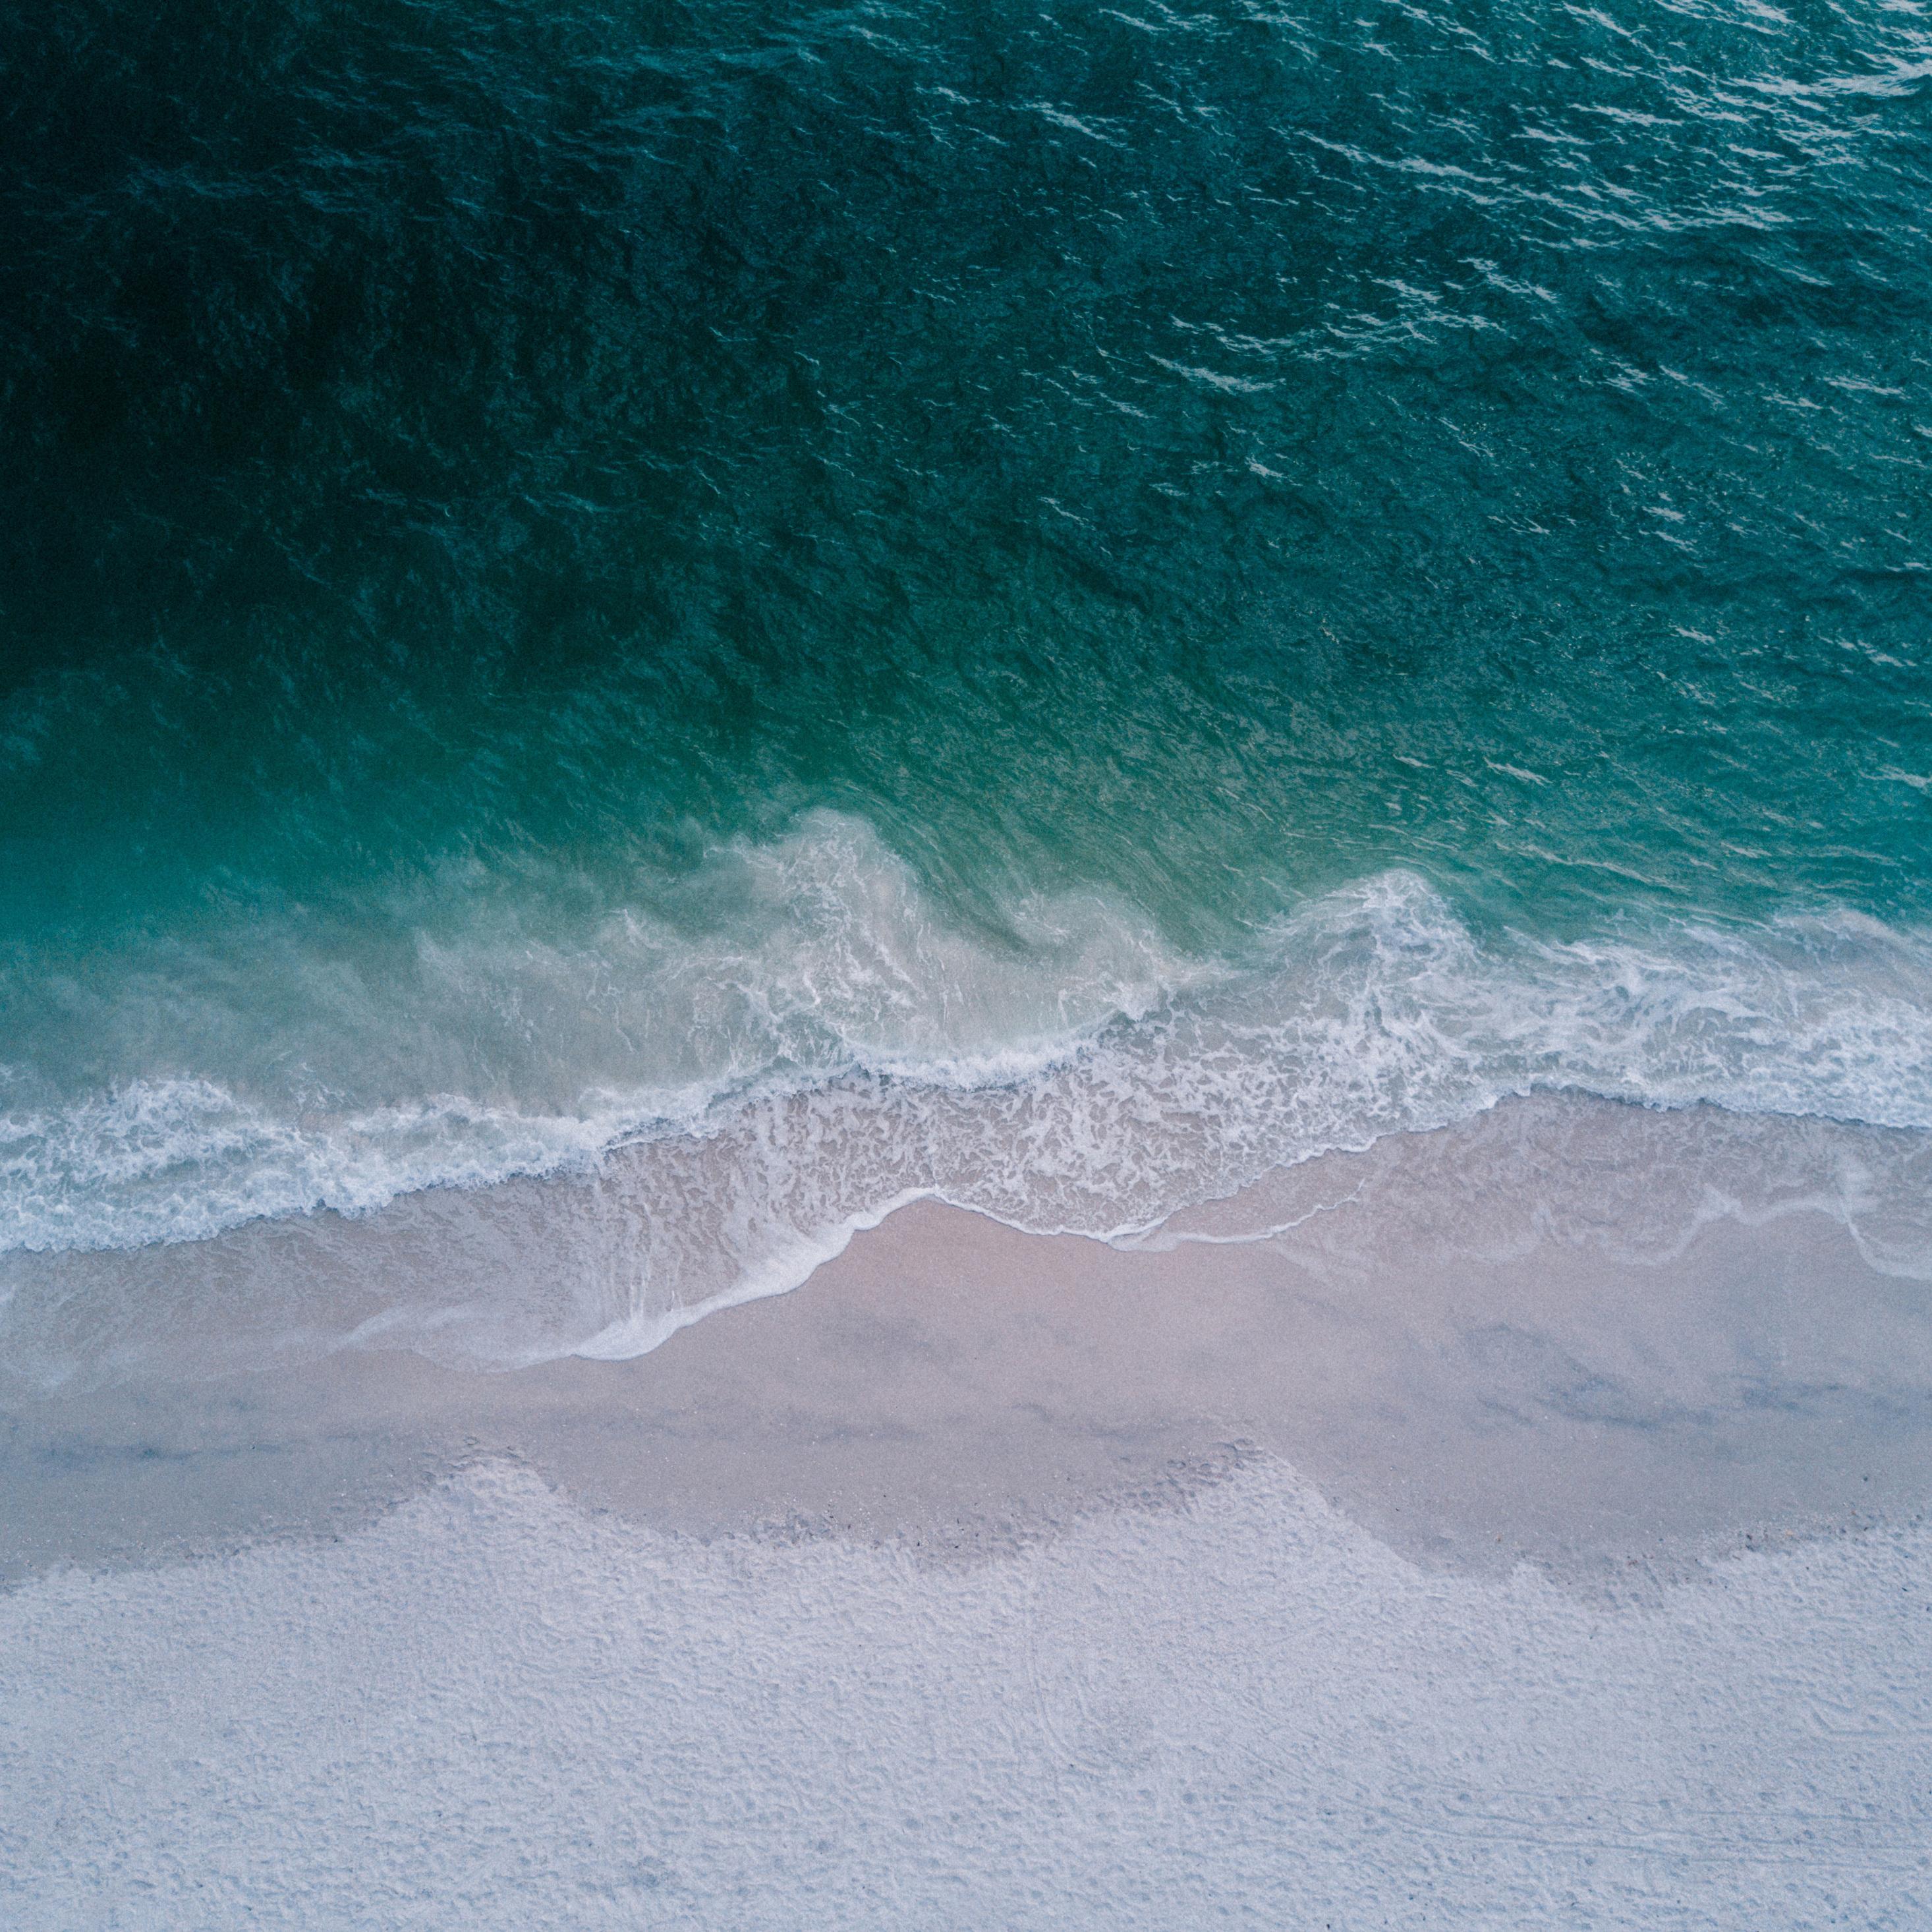 2932x2932 Seashore Top View Beach 4k Ipad Pro Retina Display